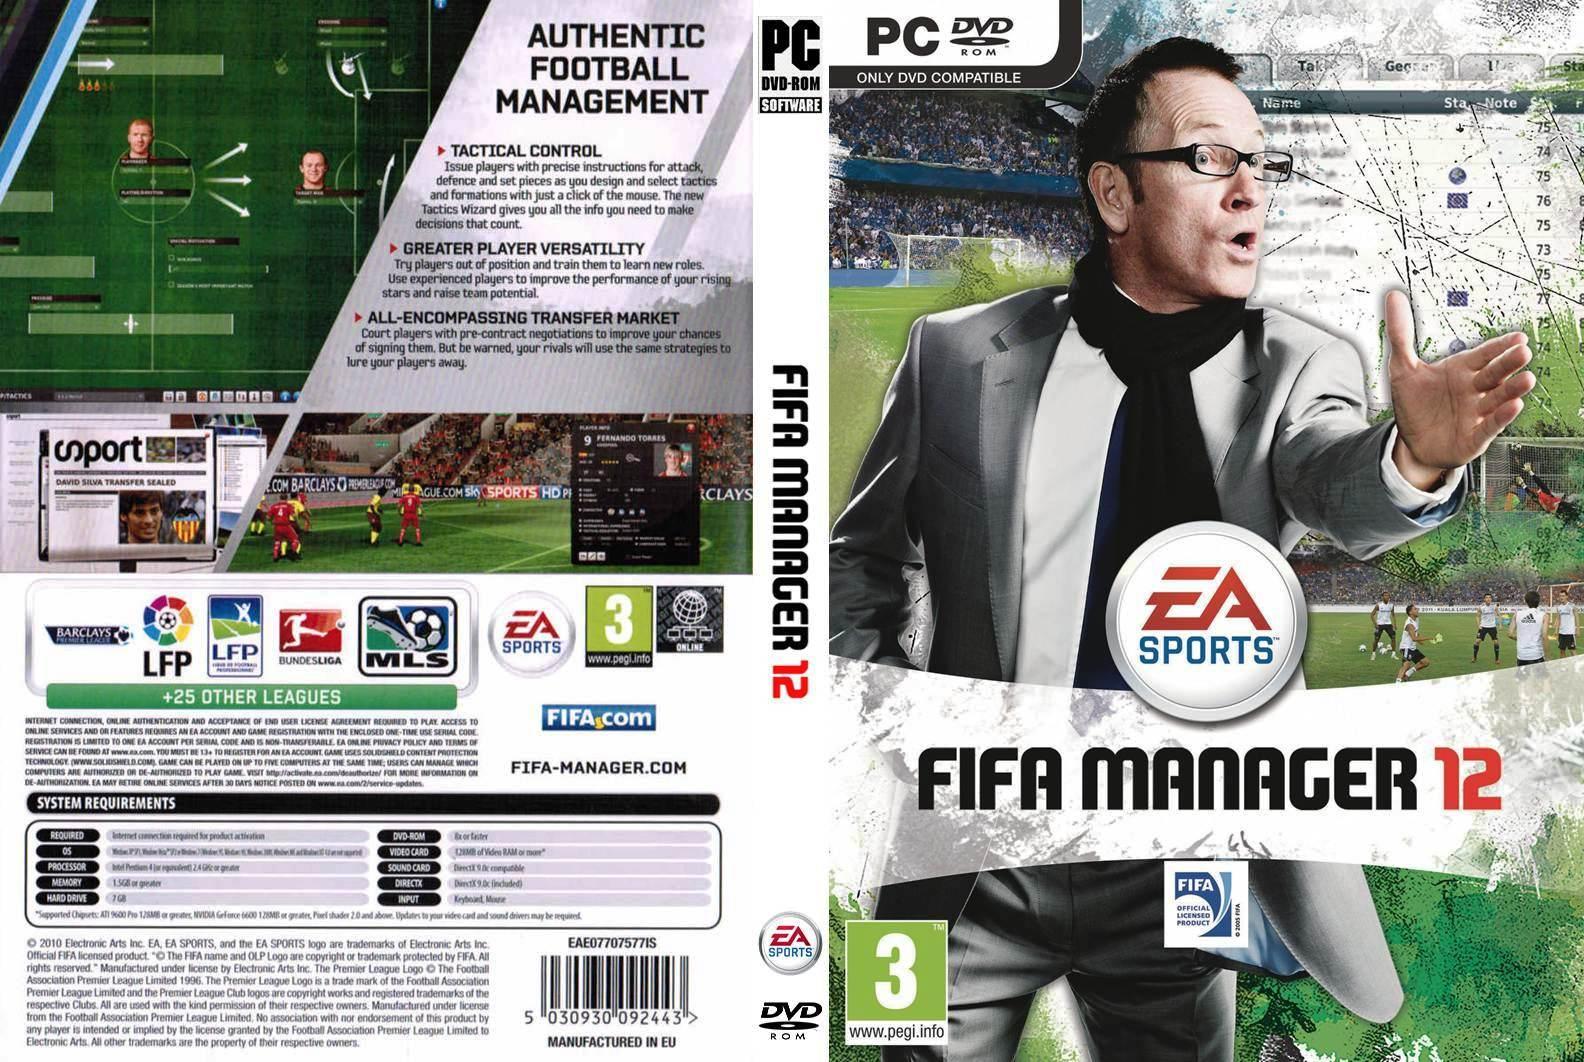 Fifa Manager 13 key generator - Pastebin.com